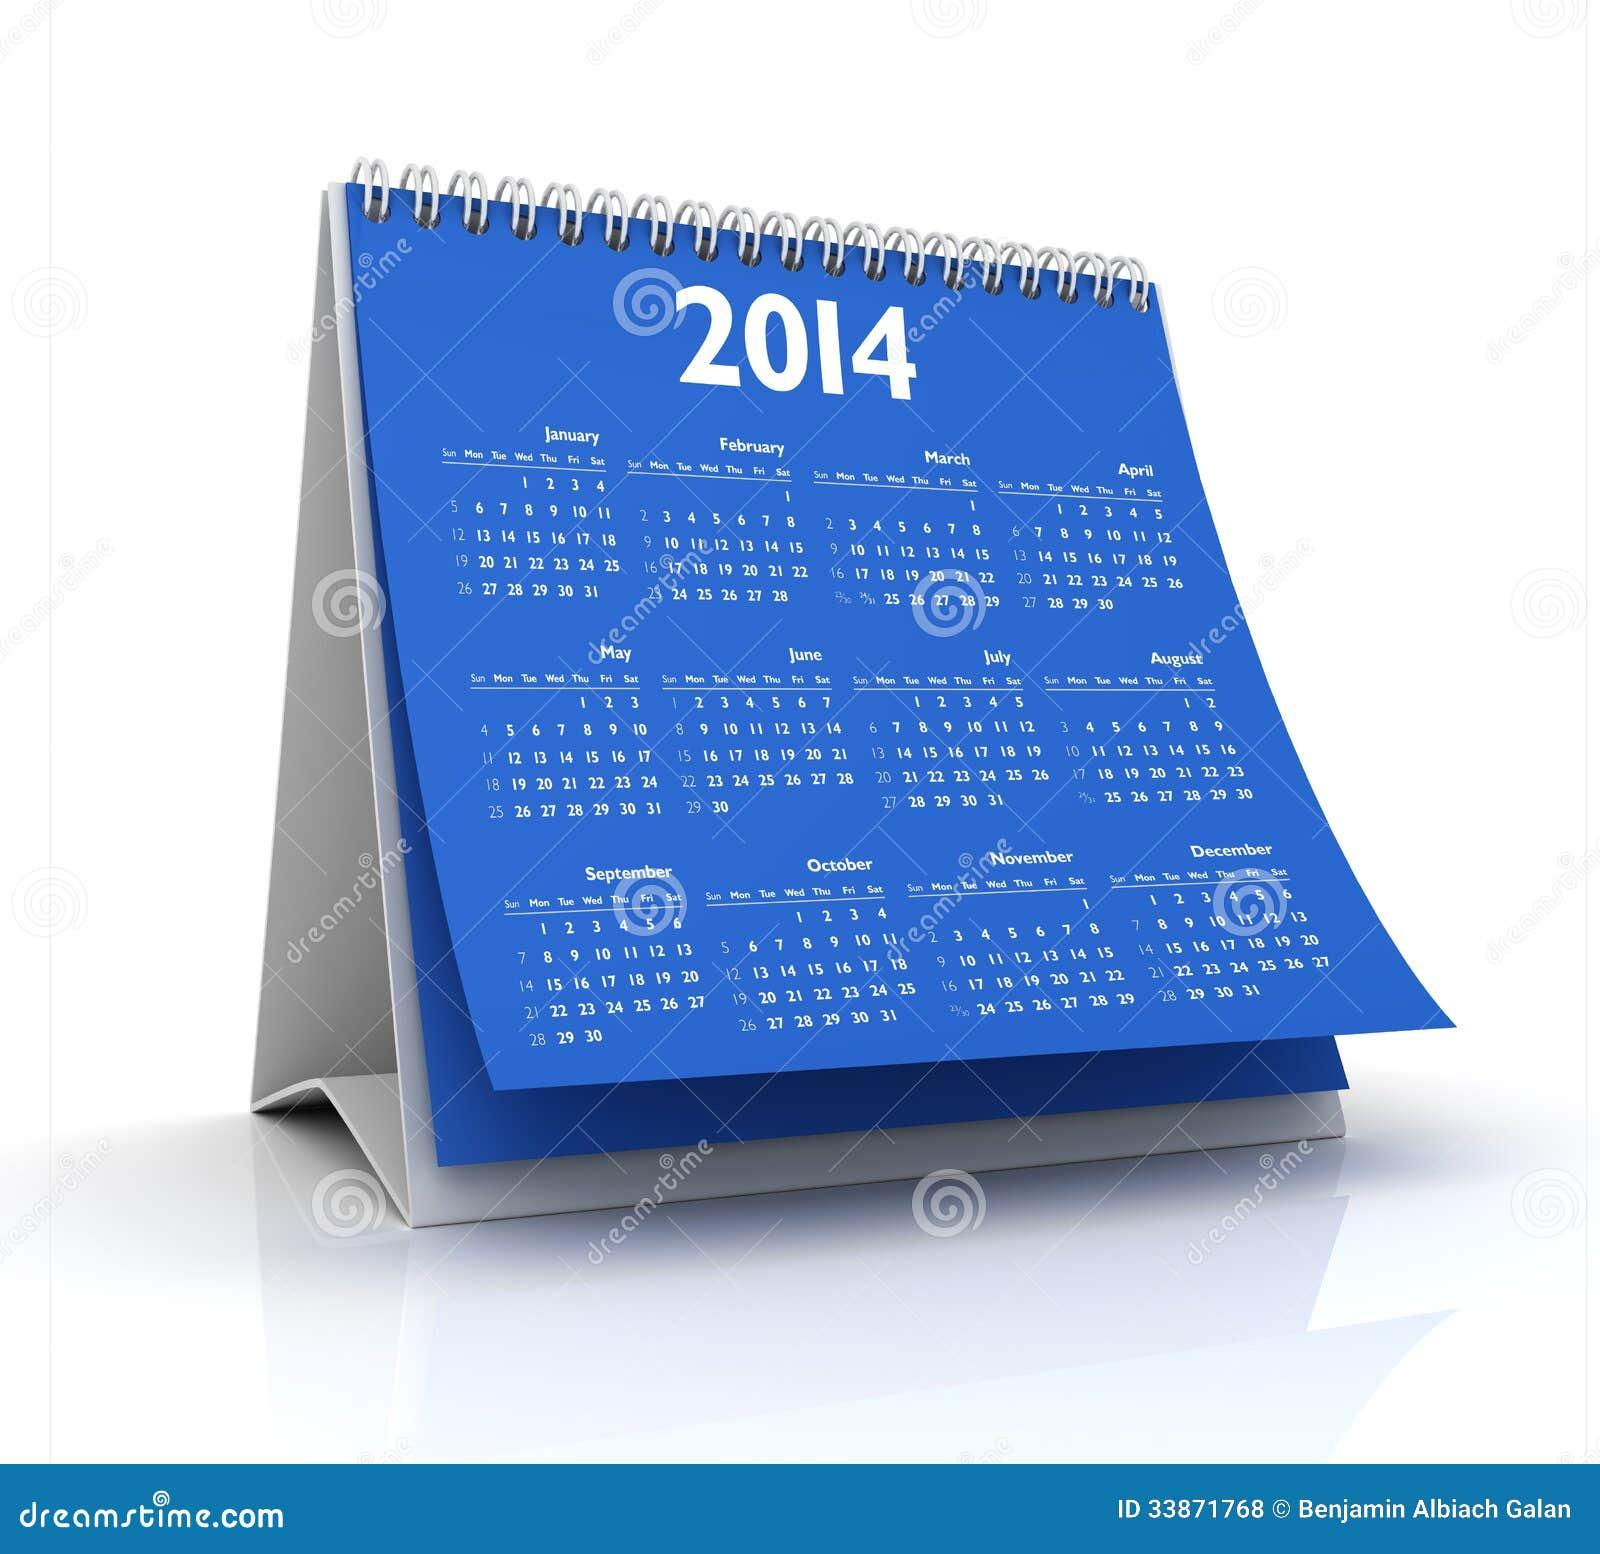 Desktop Wallpaper January 2014: Calendar 2014 Royalty Free Stock Photos